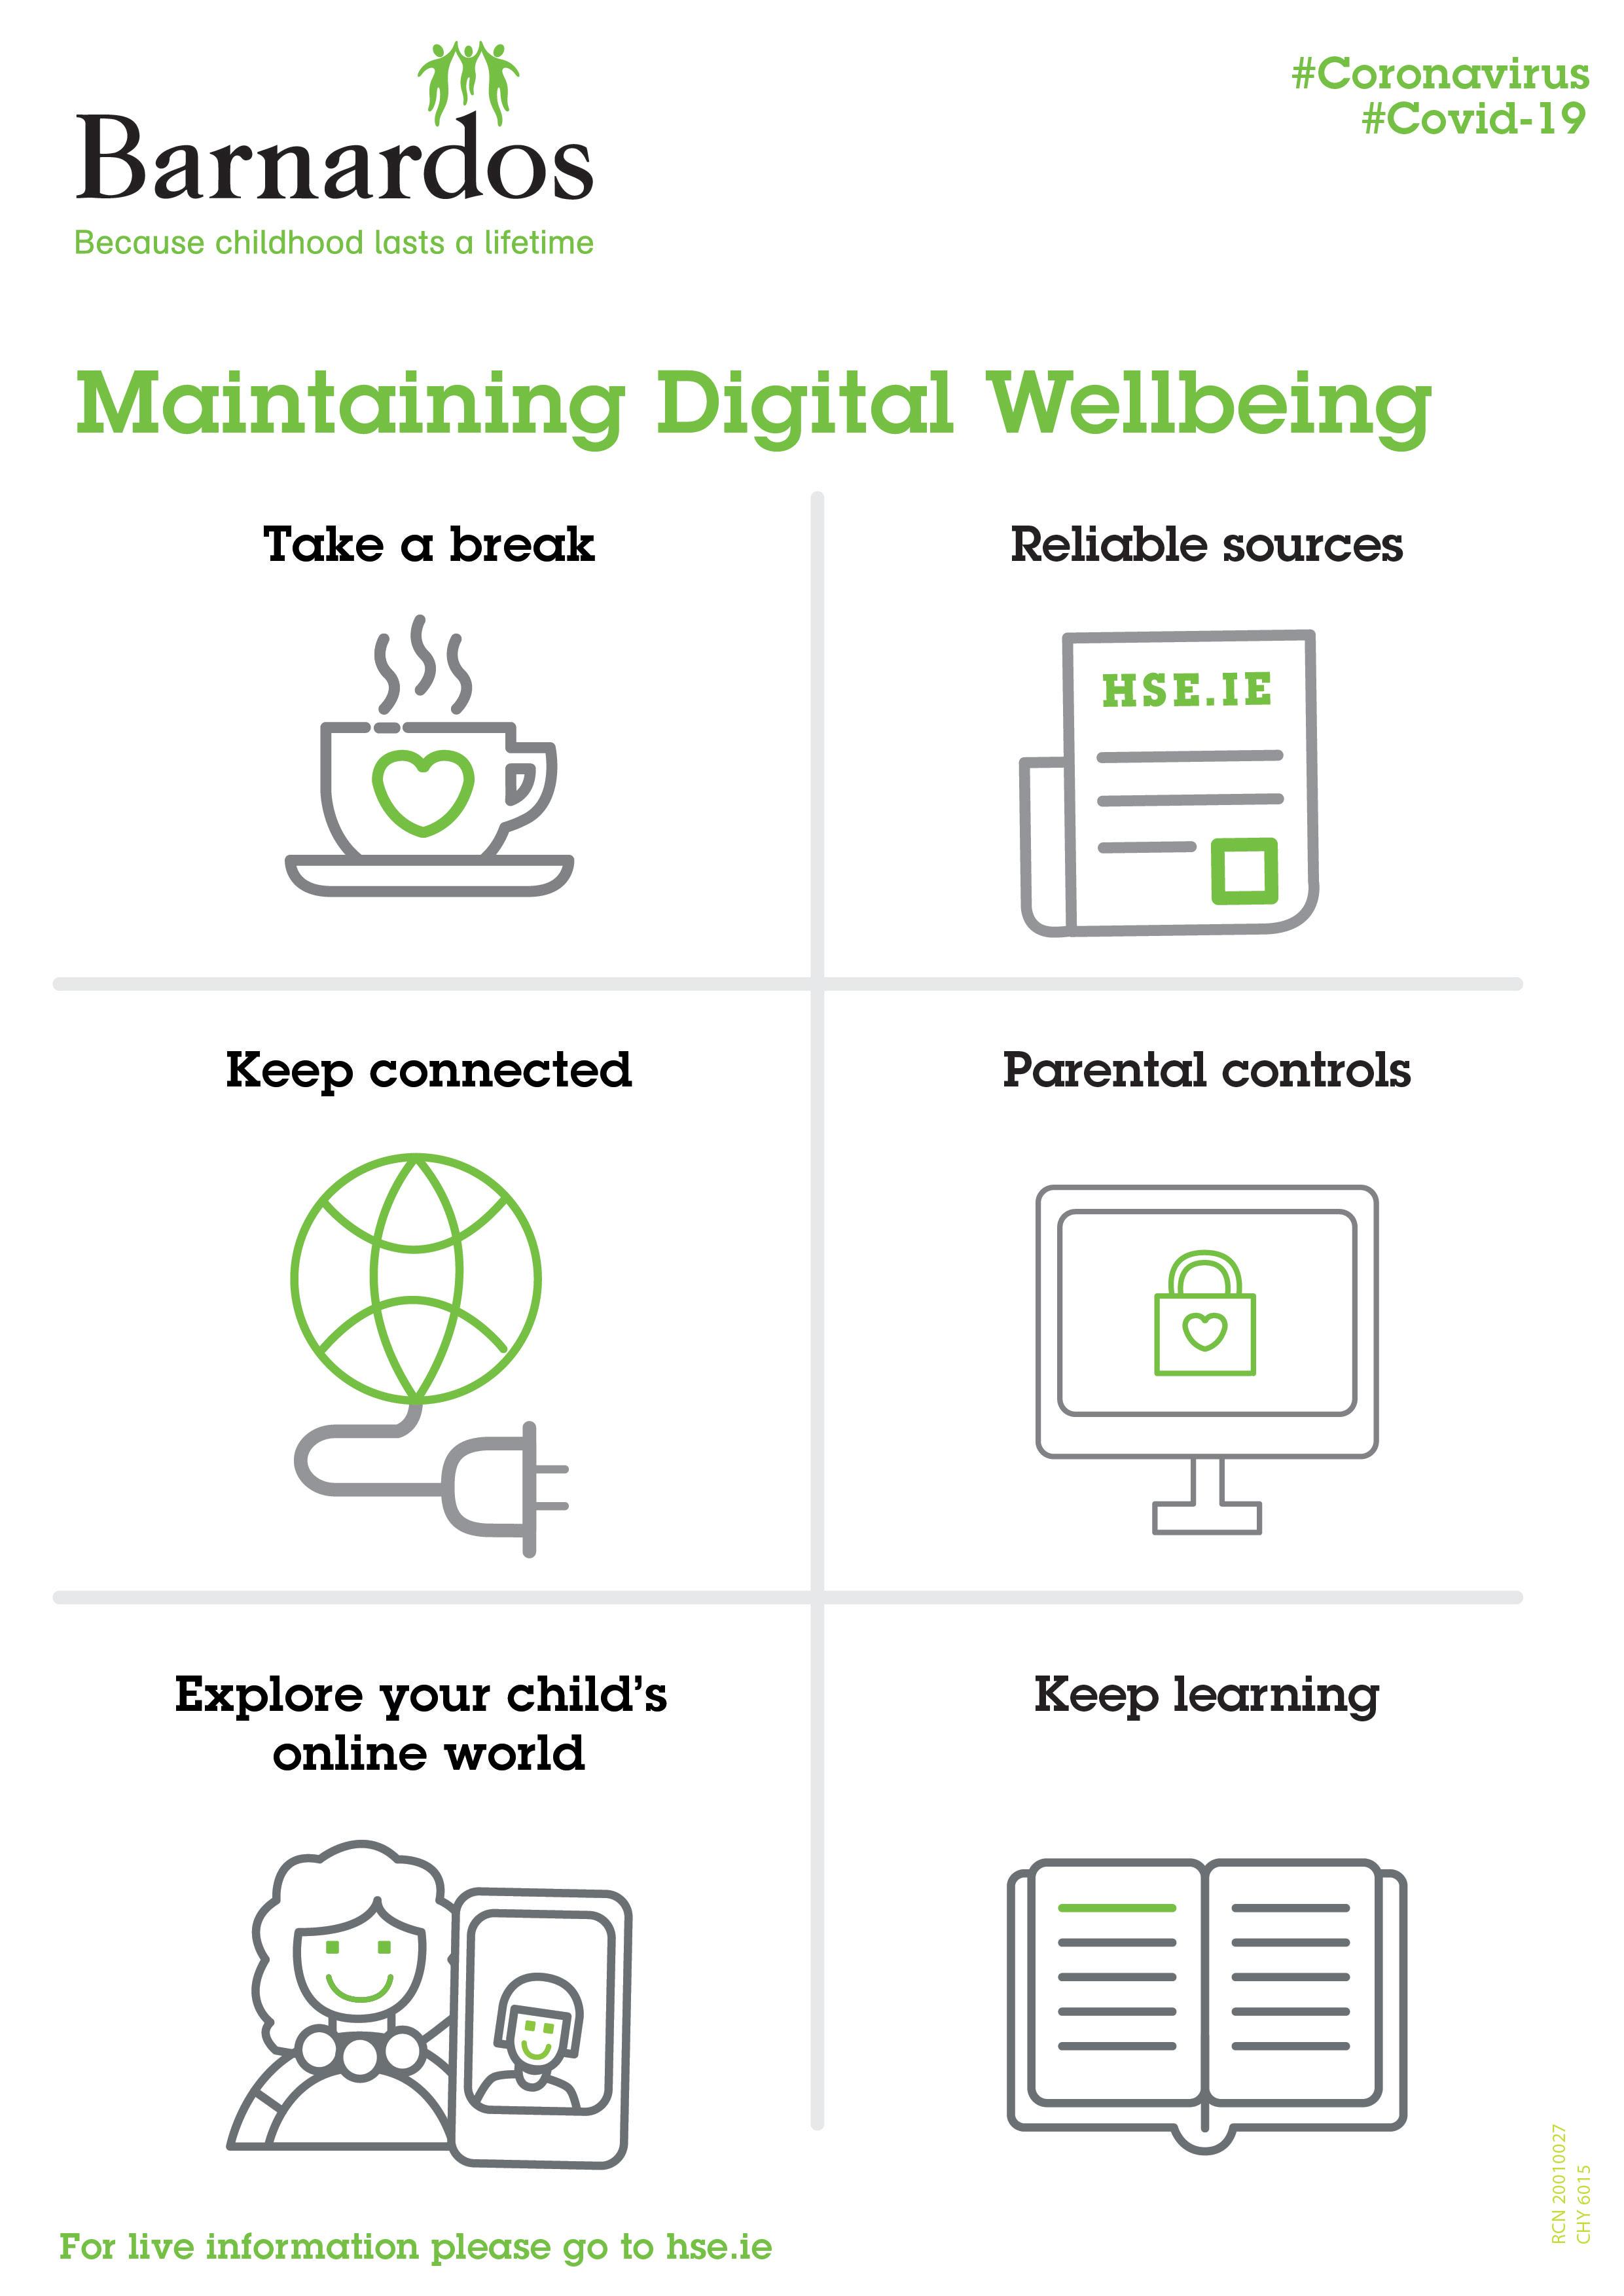 Barnardos Issues Parental Guidance To Maintain Digital Wellbeing #coronavirus #covid19